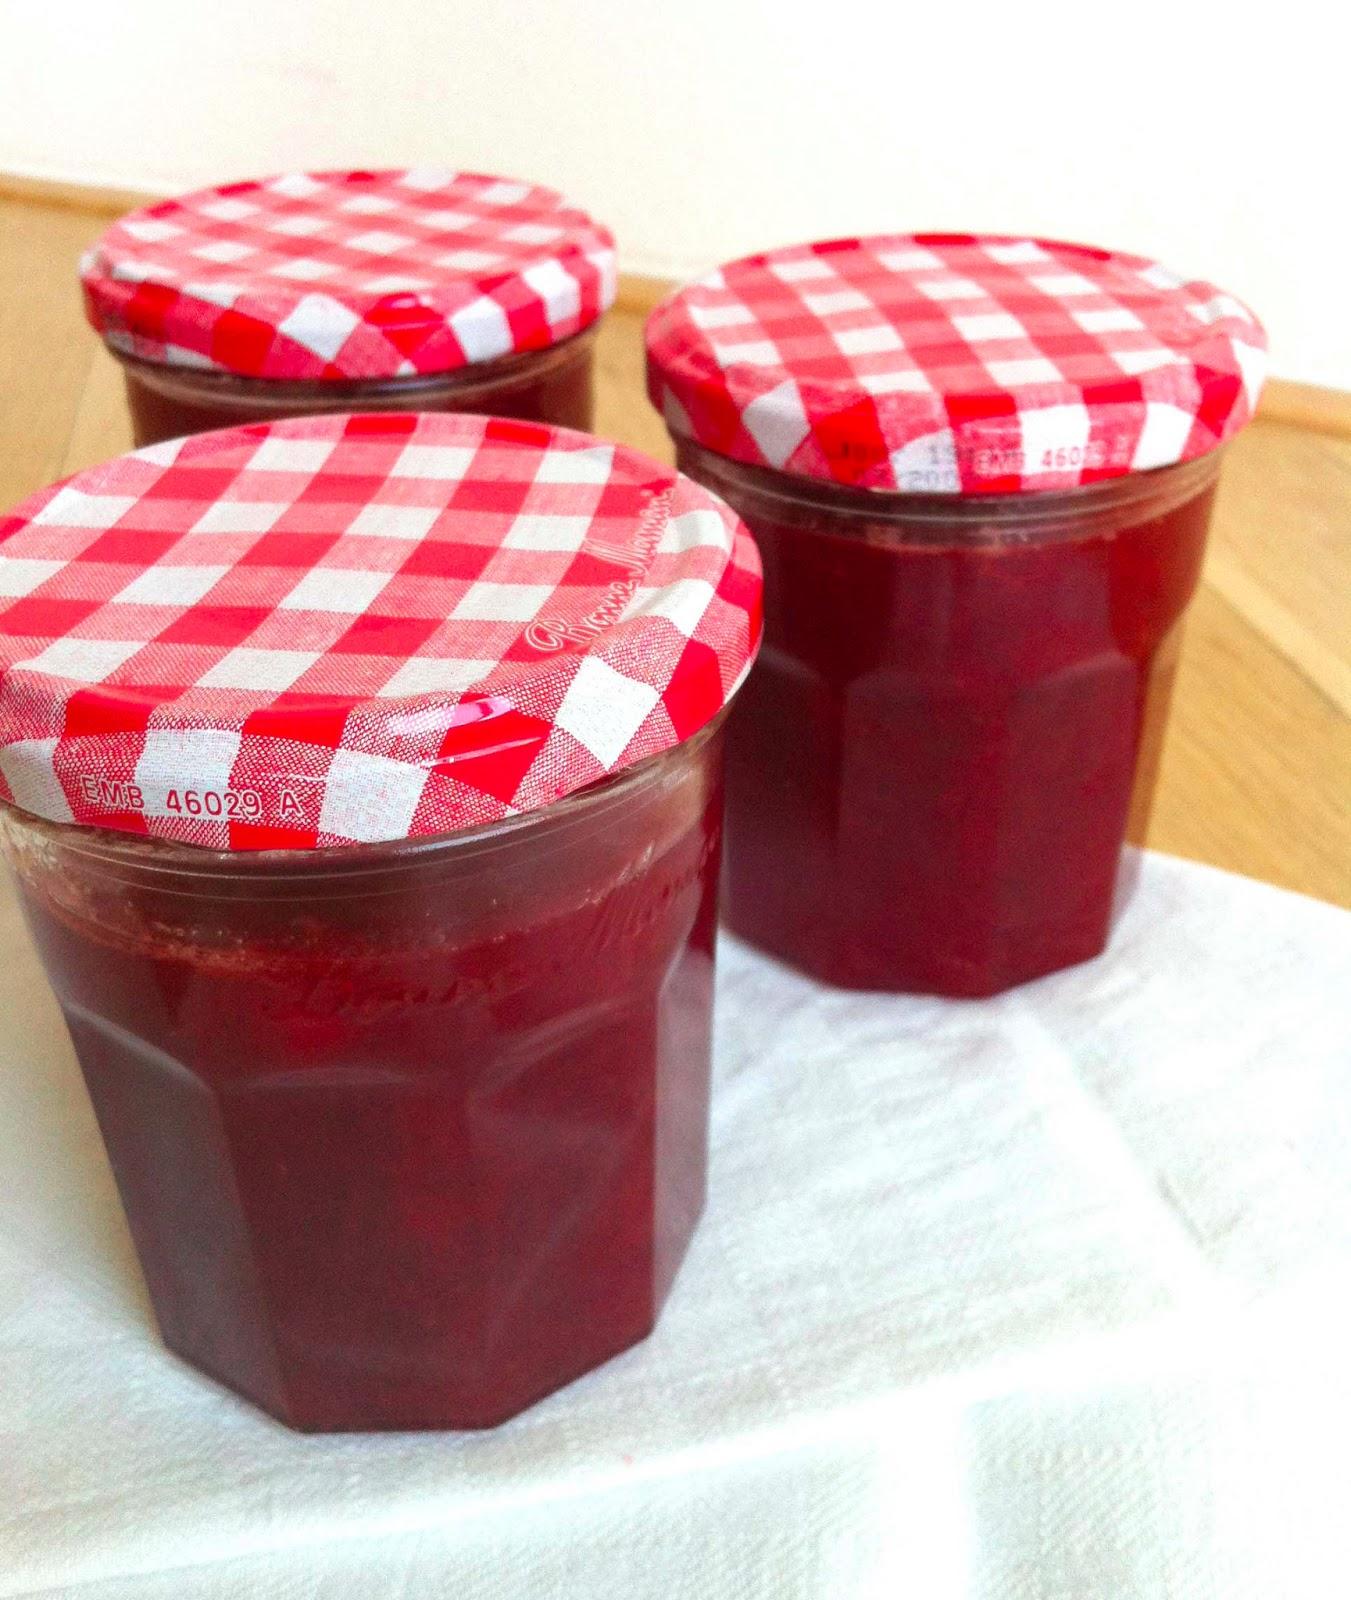 cuisiner bien erdbeer rhabarber marmelade. Black Bedroom Furniture Sets. Home Design Ideas